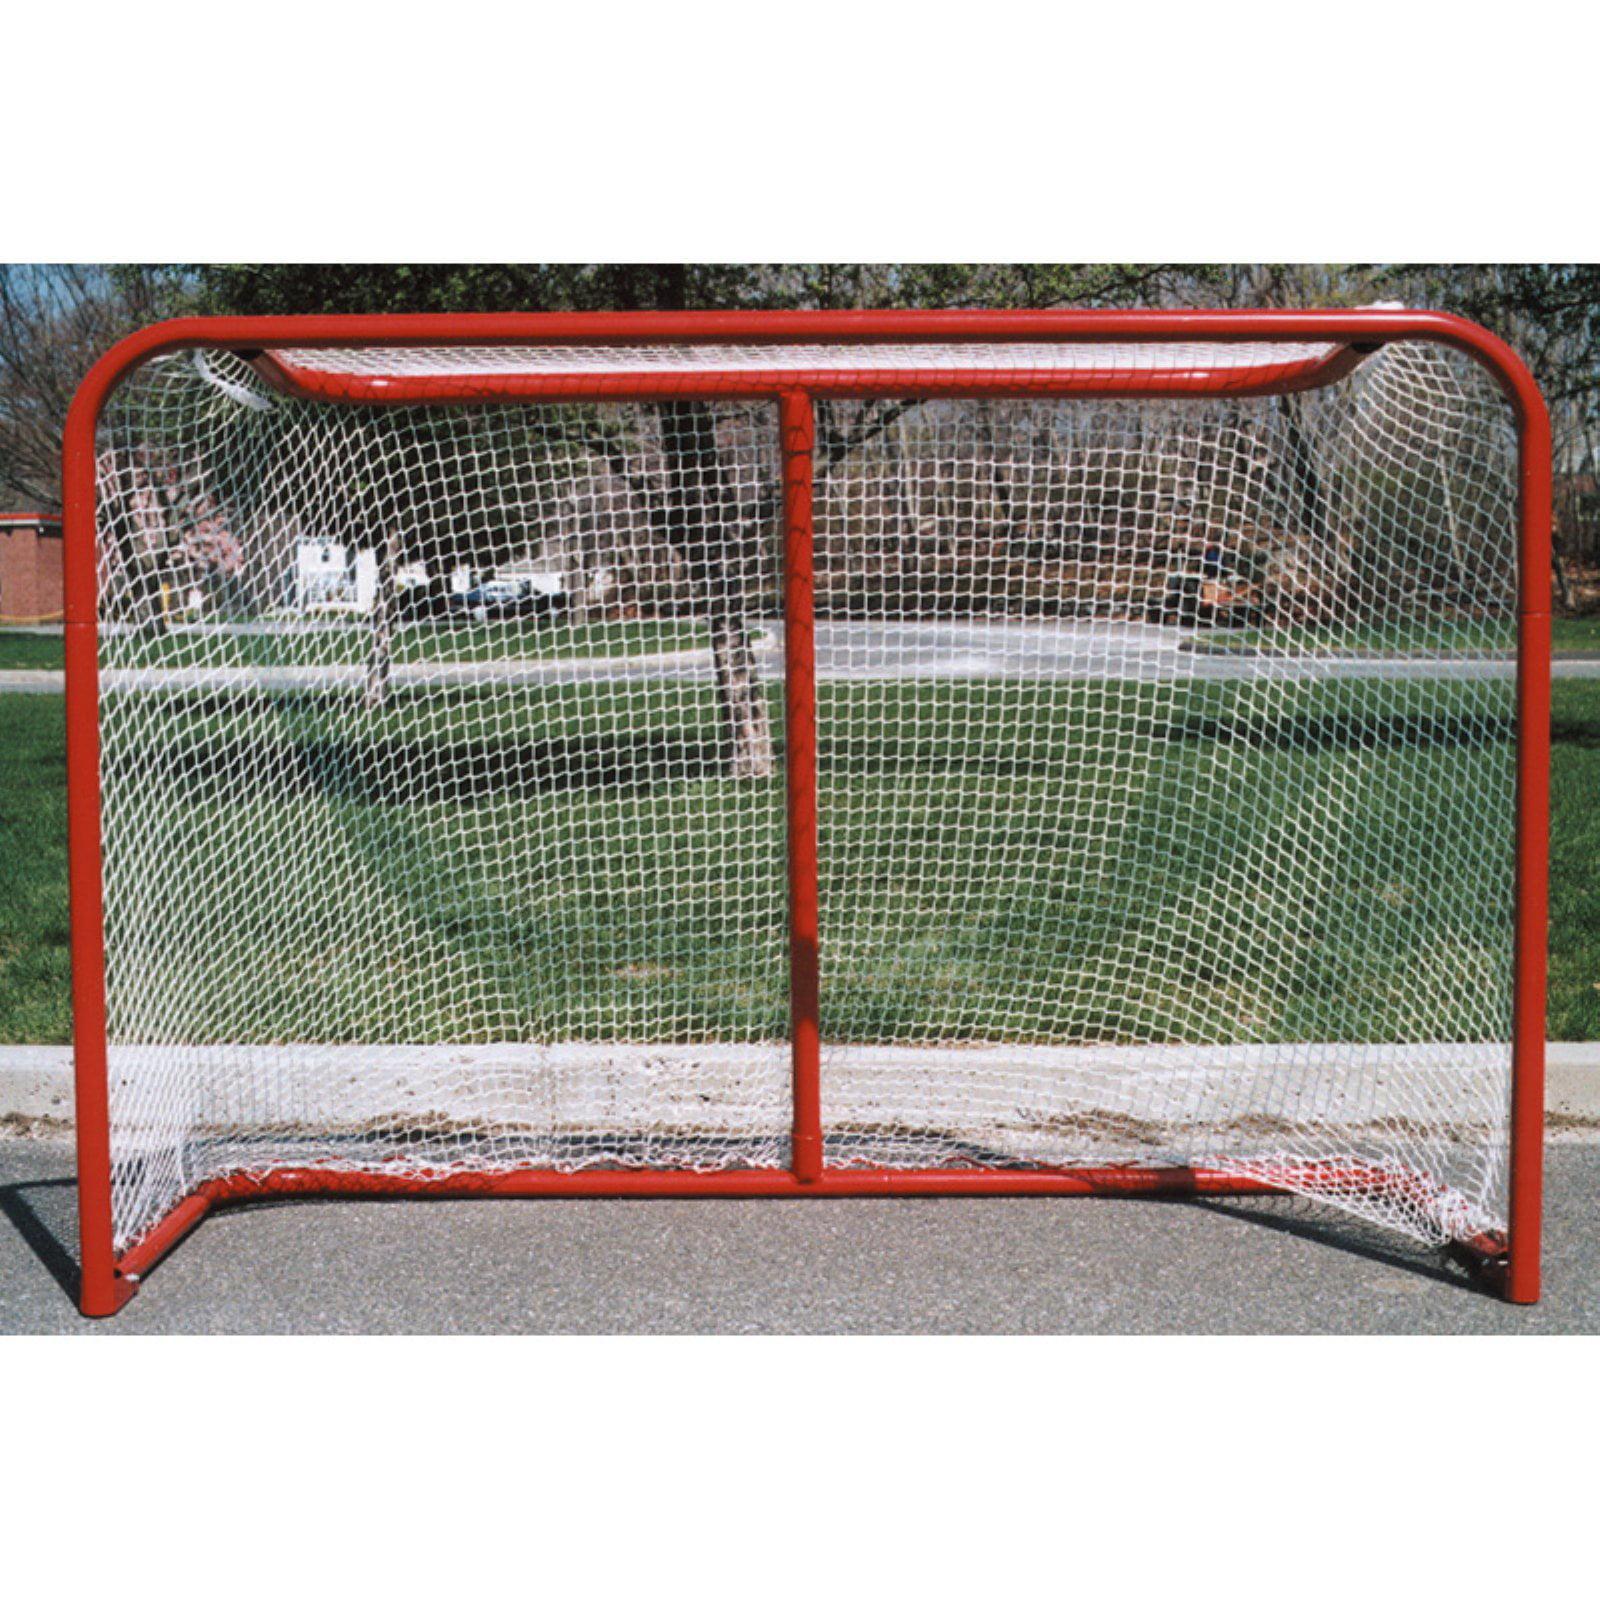 Heavy Duty 4 x 6 ft. Street Roller Hockey Goal by Goal Sporting Goods Inc